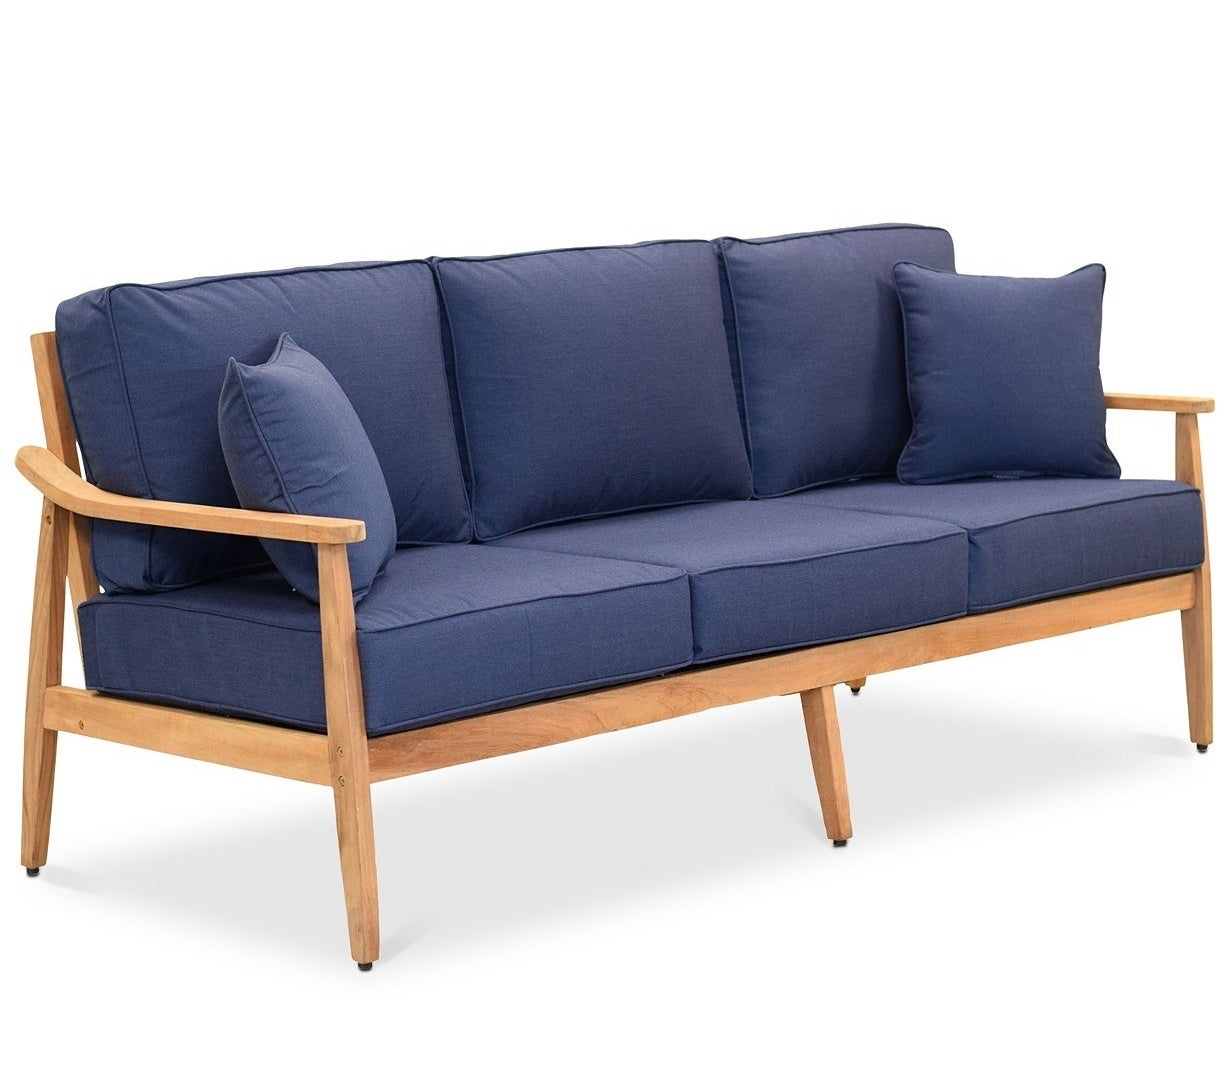 wood sofa frame with plush dark blue cushions and pillows